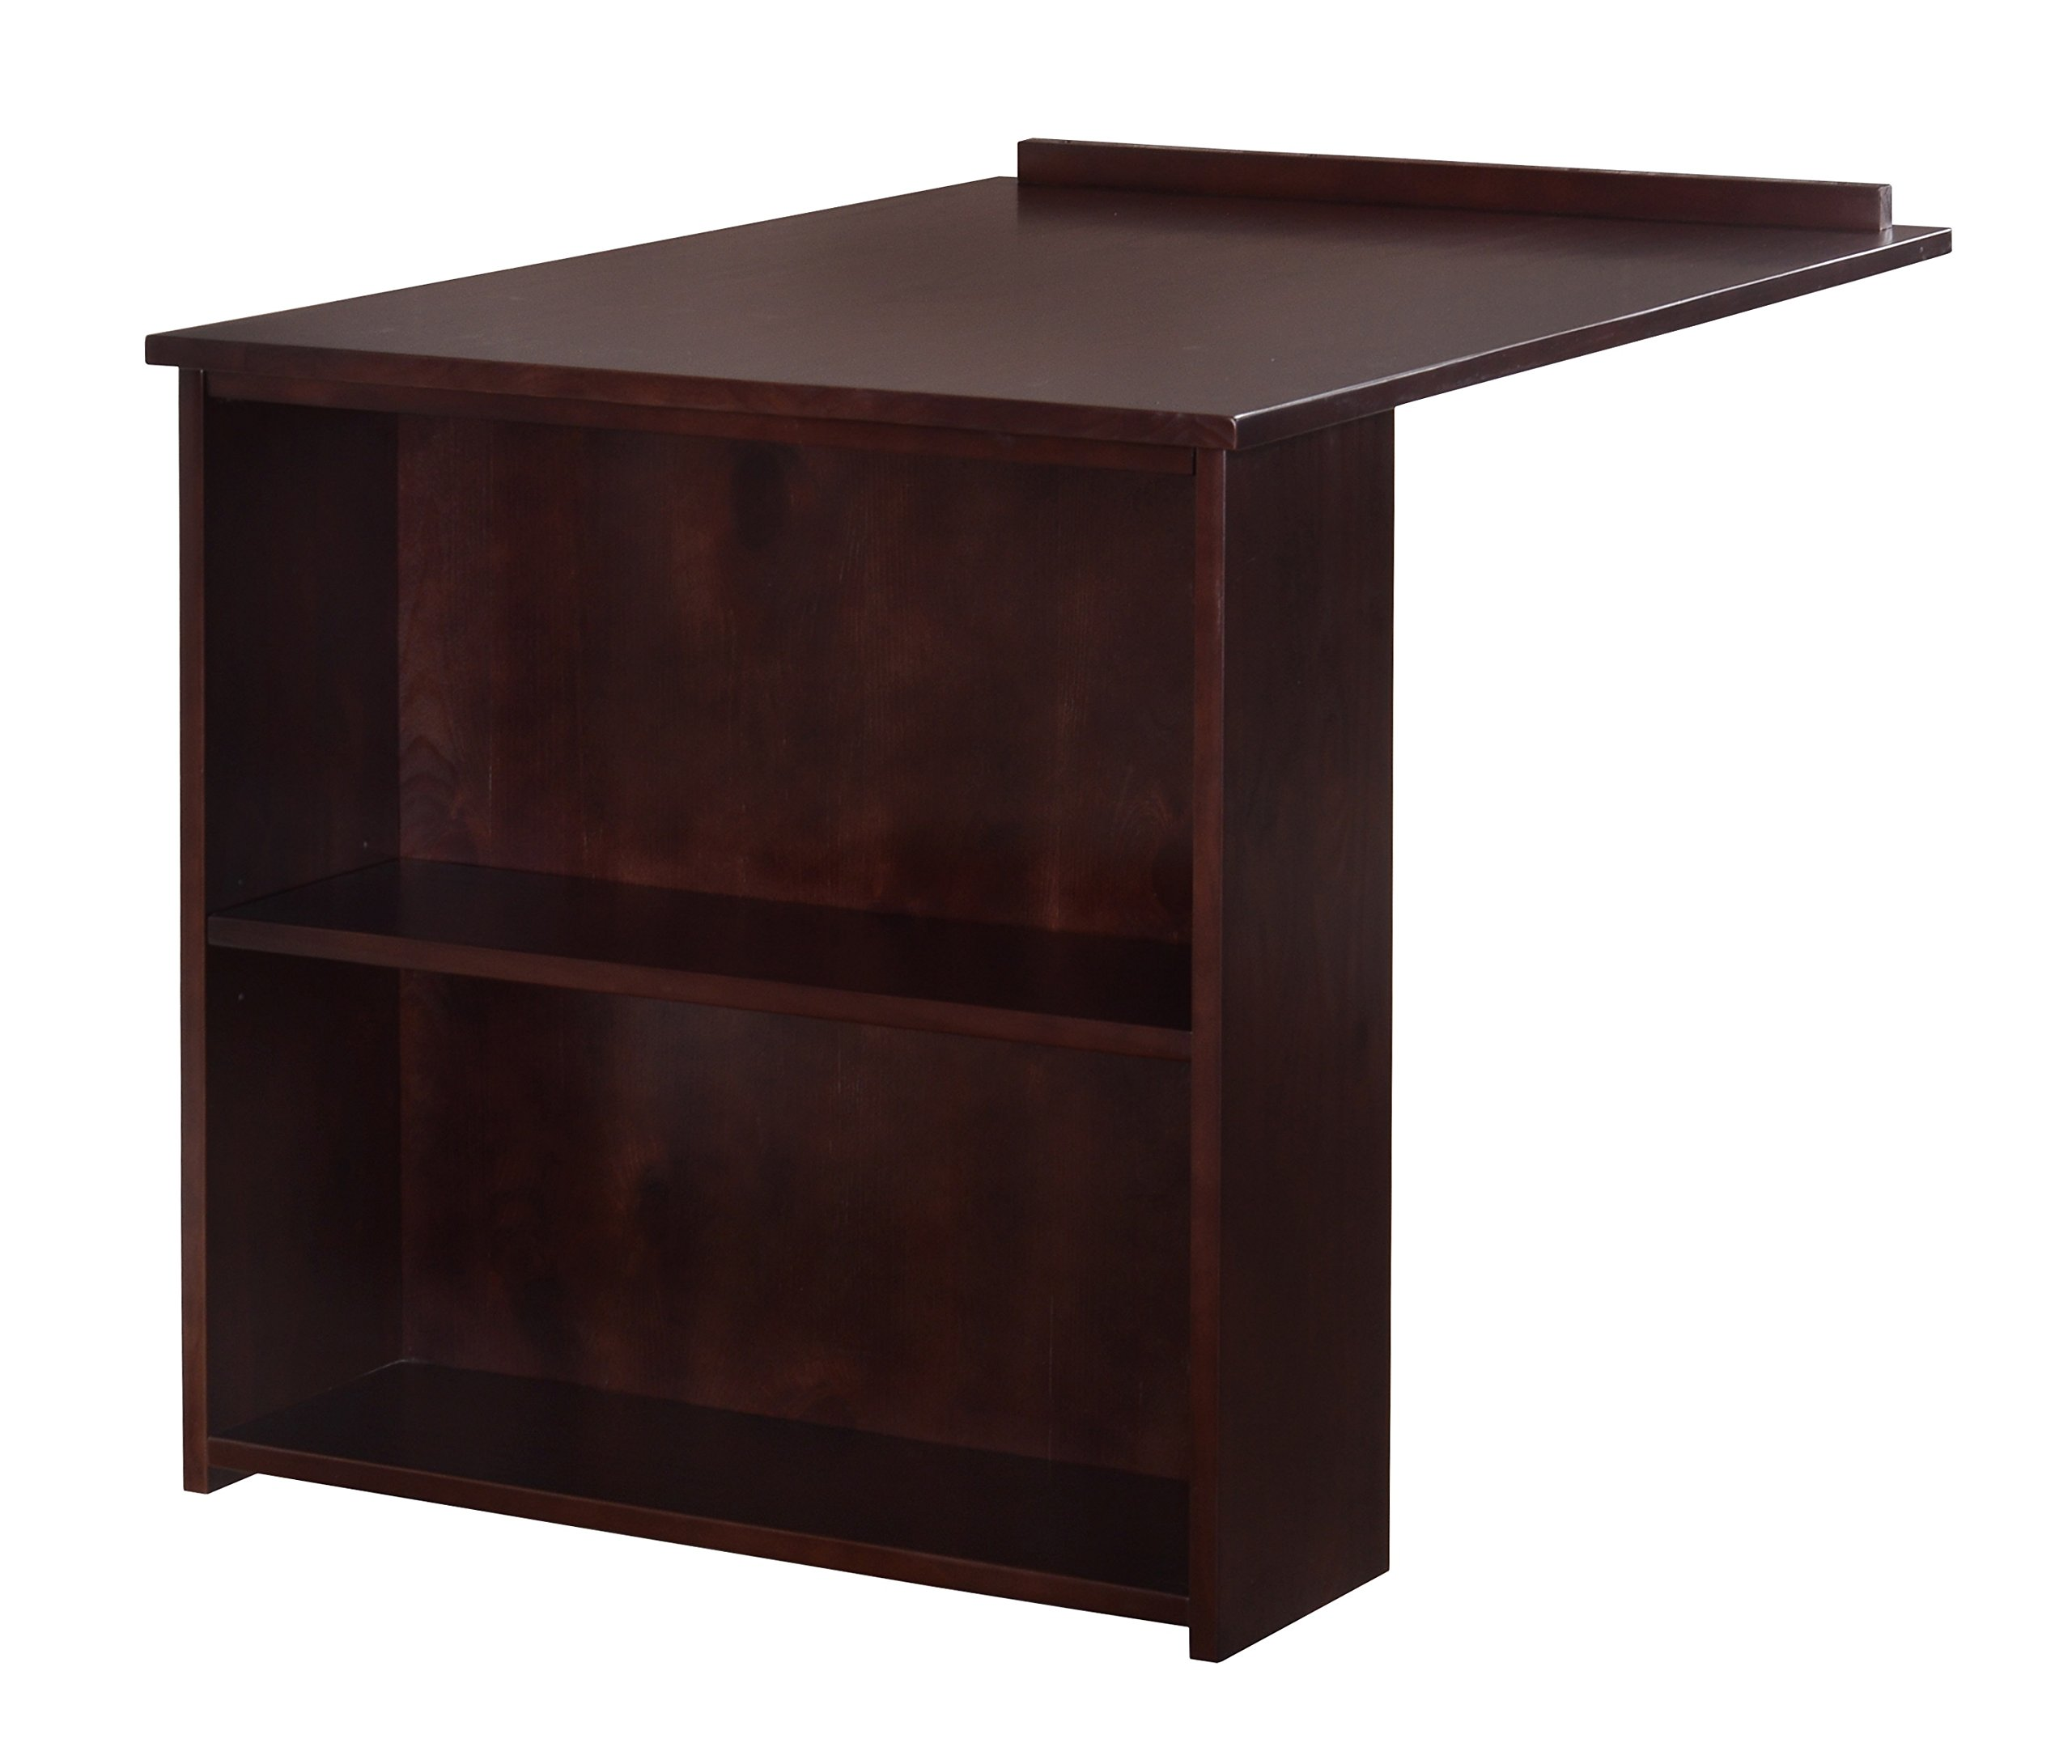 Whistler Junior Slide Out Desk - Espresso by Canwood